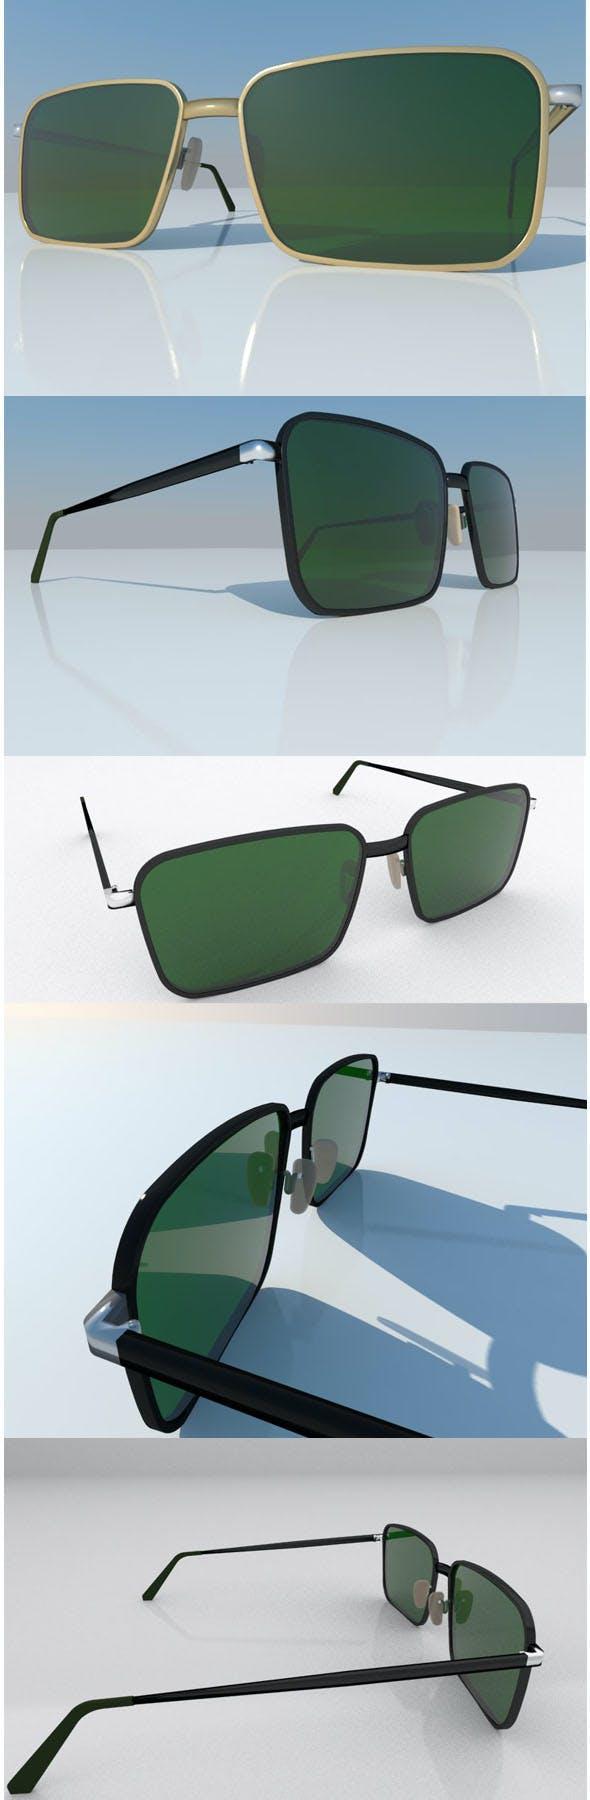 spectacles eyeglasses sunglasses - 3DOcean Item for Sale